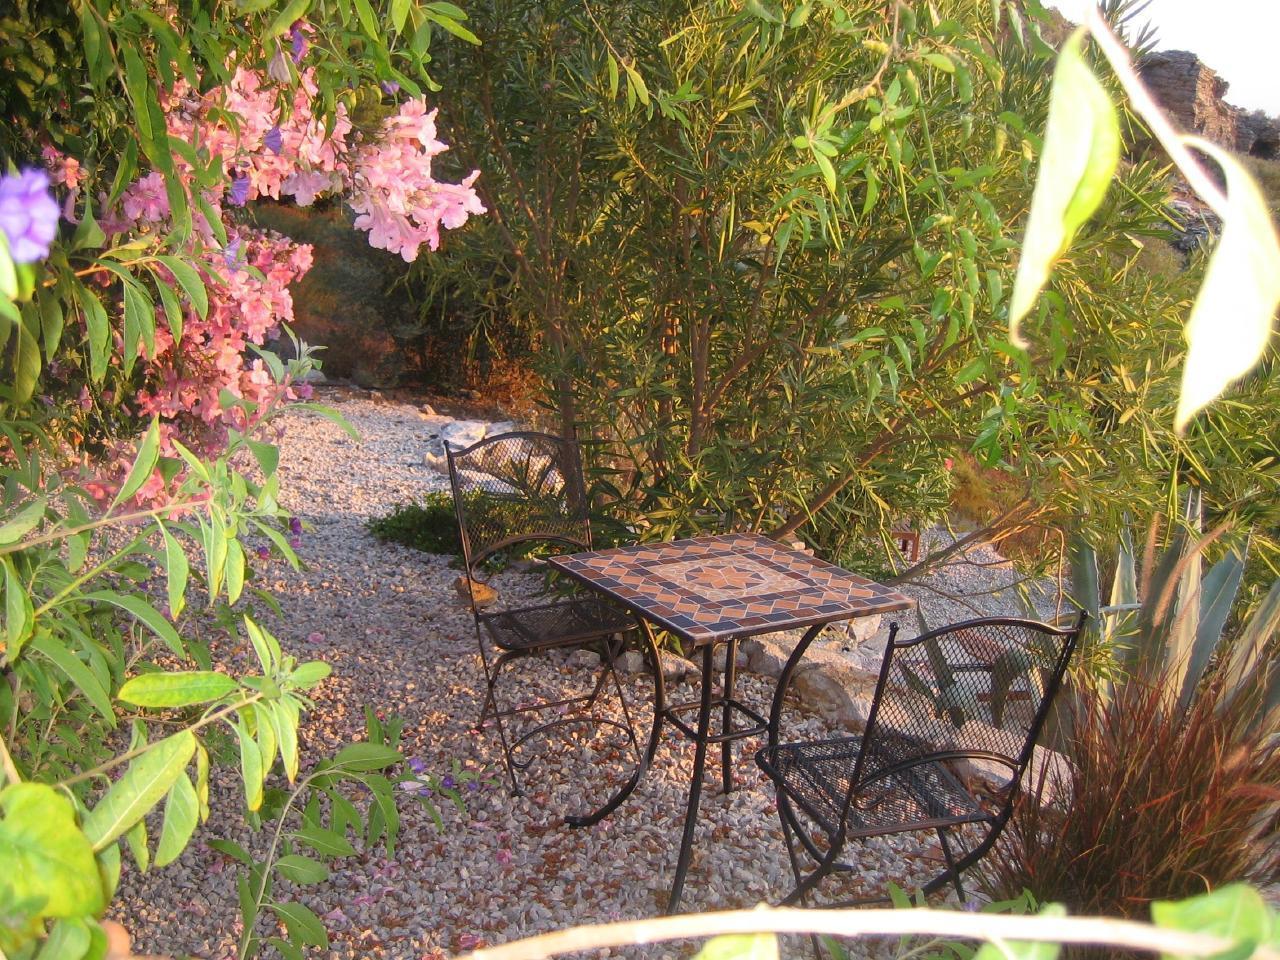 Maison de vacances Exklusives Chalet, romantisch am Berghang und Meer gelegen (2506674), Mesudiye, , Région Egéenne, Turquie, image 30